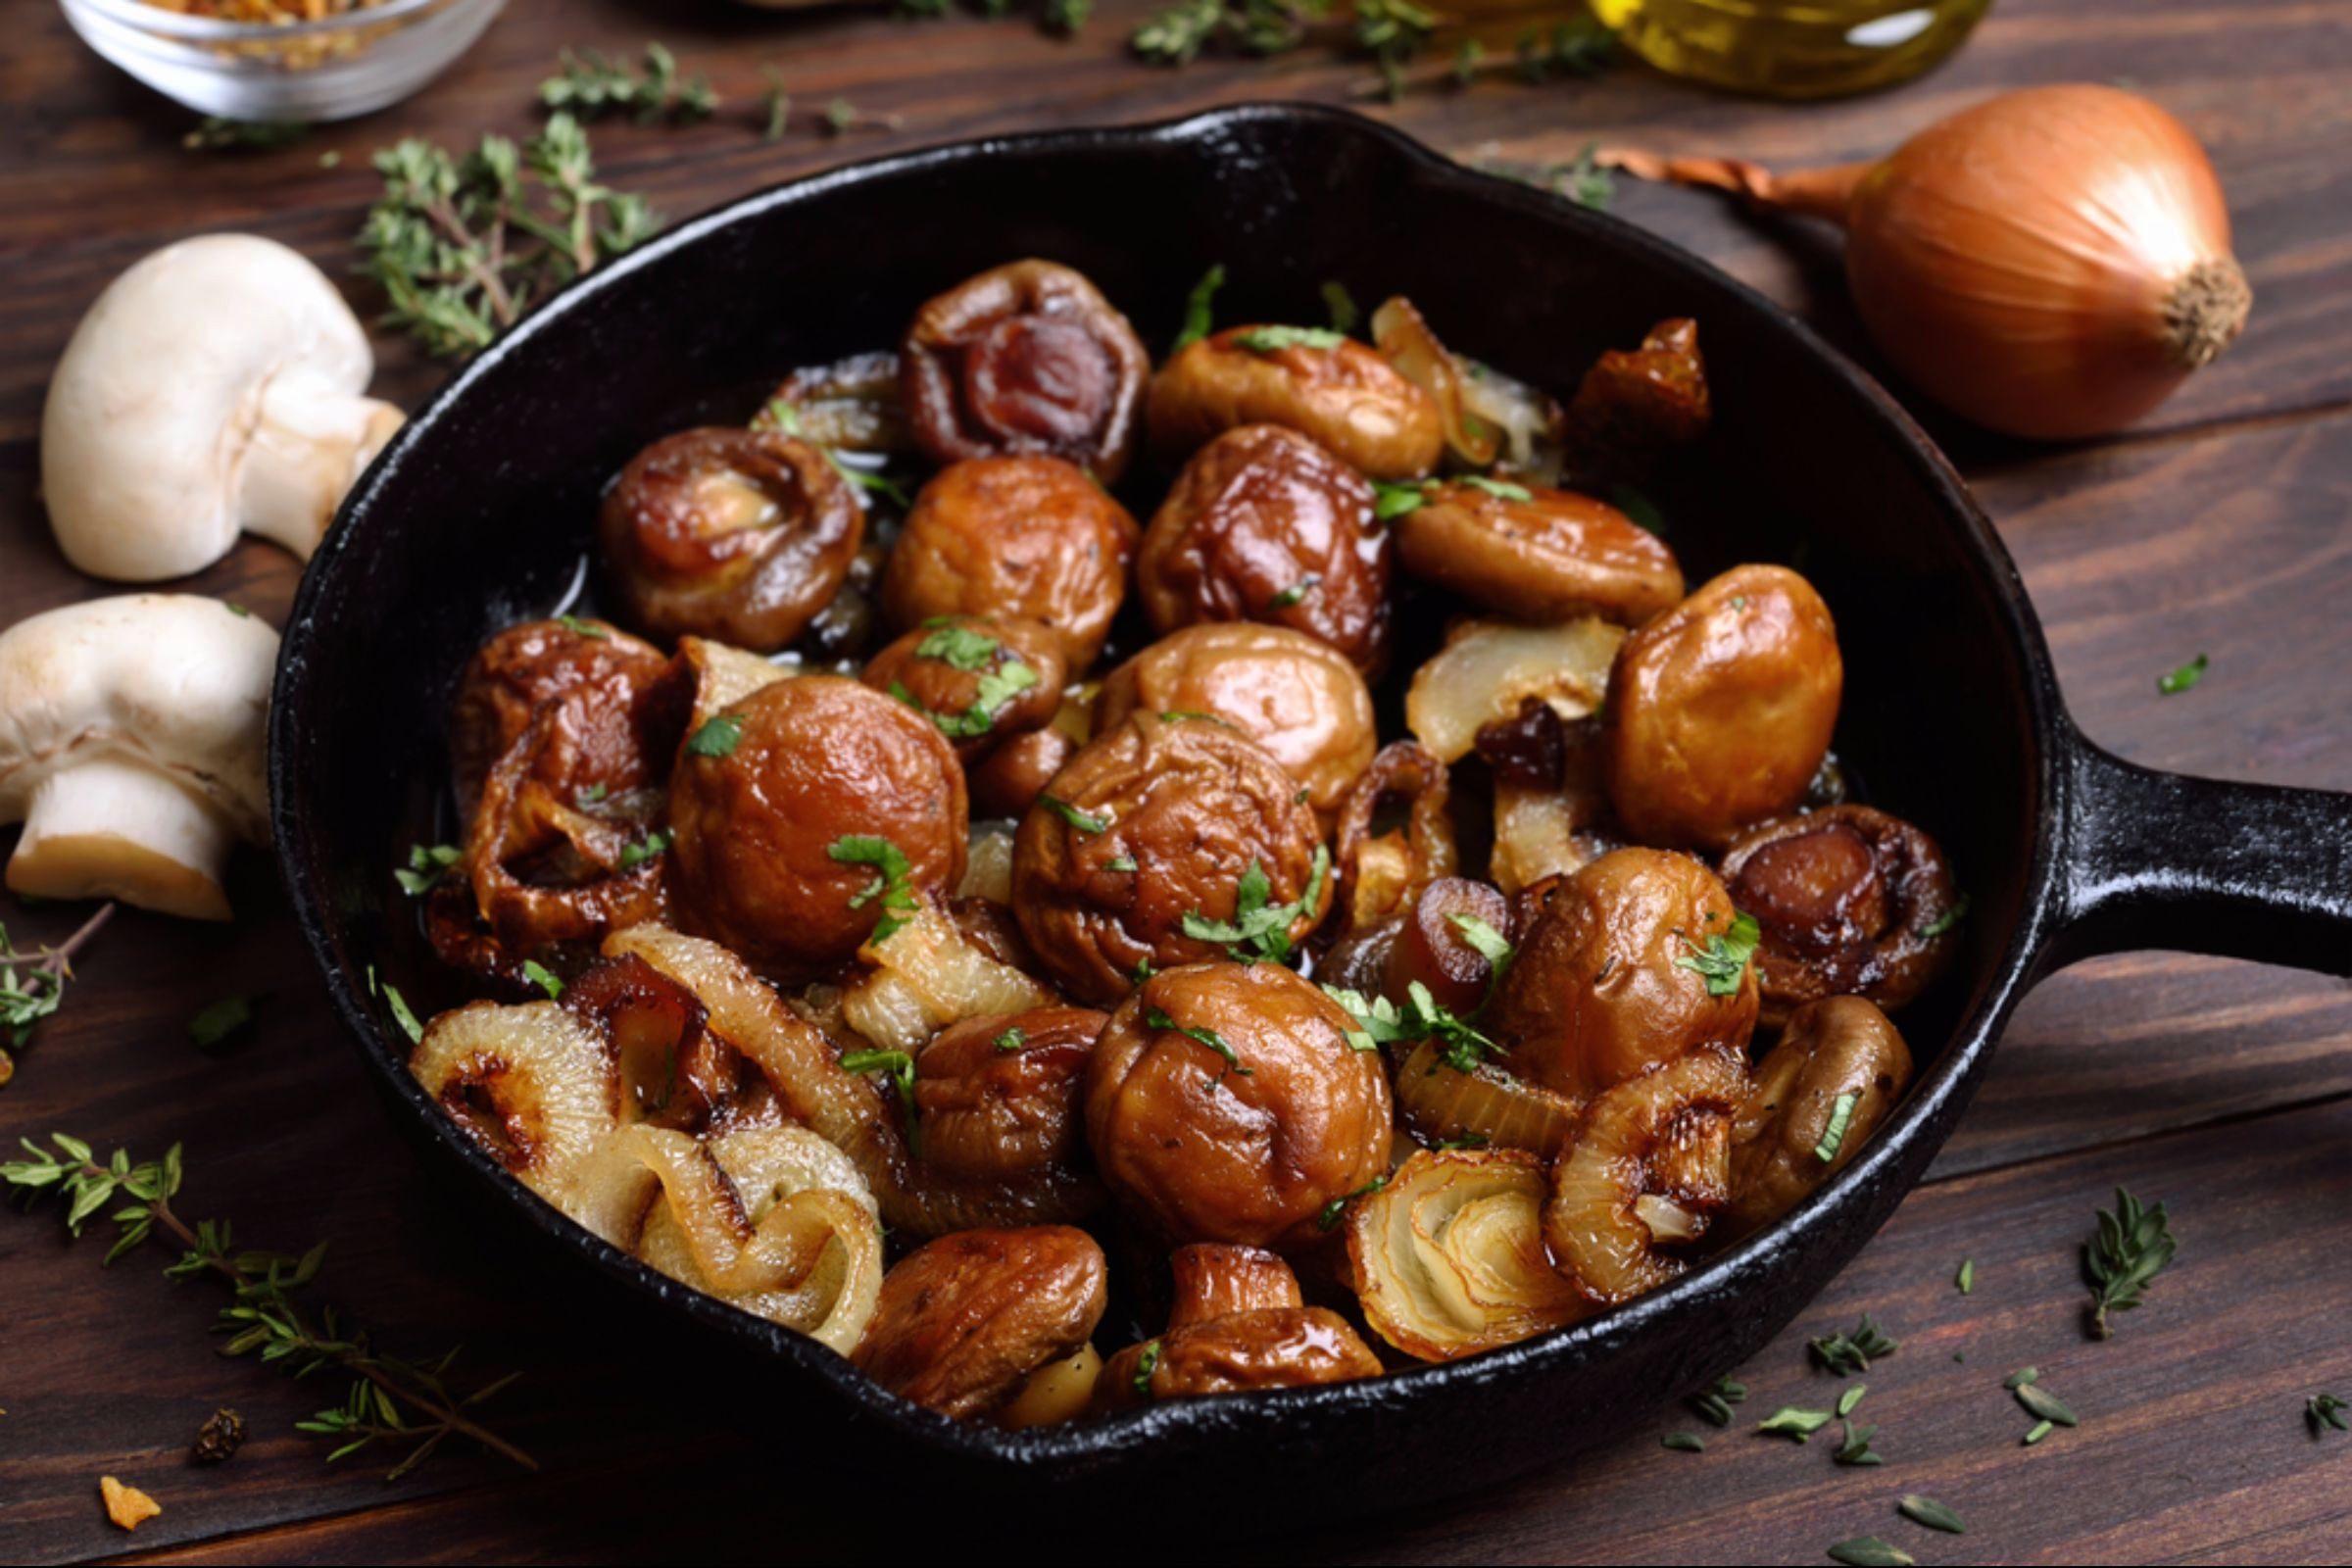 06-mushrooms-Fruits and Vegetables that Taste Best in the Fall_654540736-Tatiana Volgutova